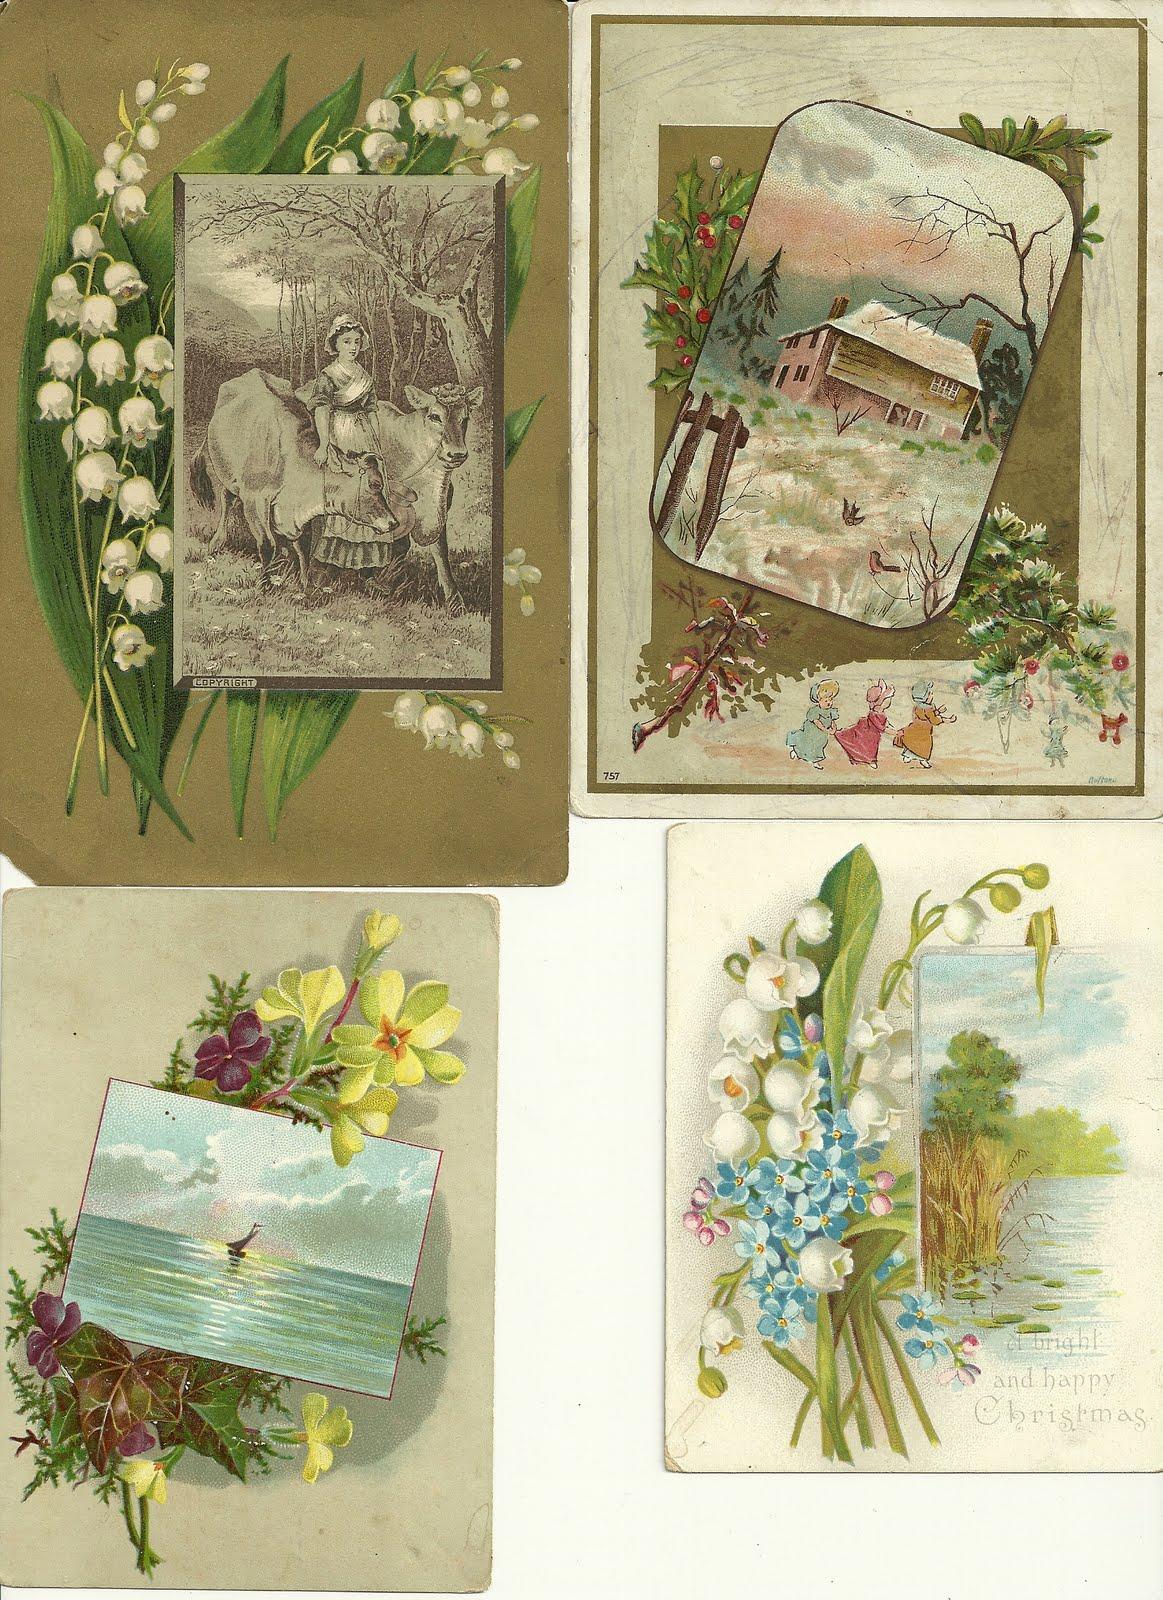 Heirlooms reunited victorian era greeting cards signed by emily may victorian era greeting cards signed by emily may macgregor m4hsunfo